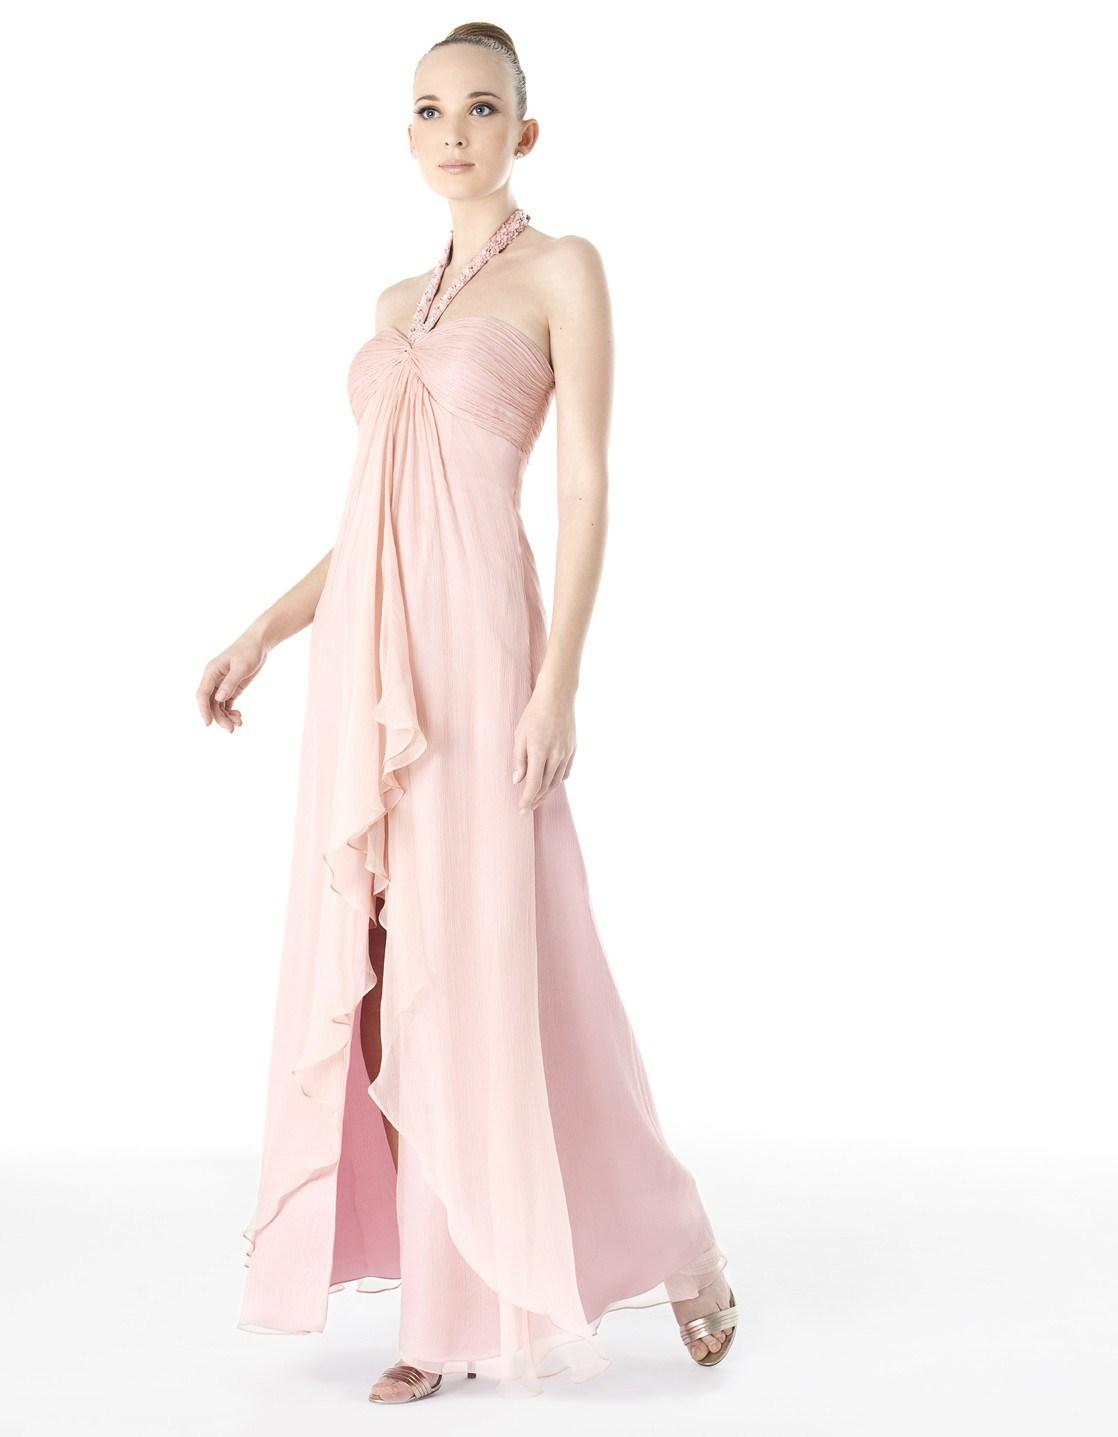 macy bridesmaid dresses purple macy's wedding dresses Pink Bridesmaid Dresses Macy S Overlay Wedding